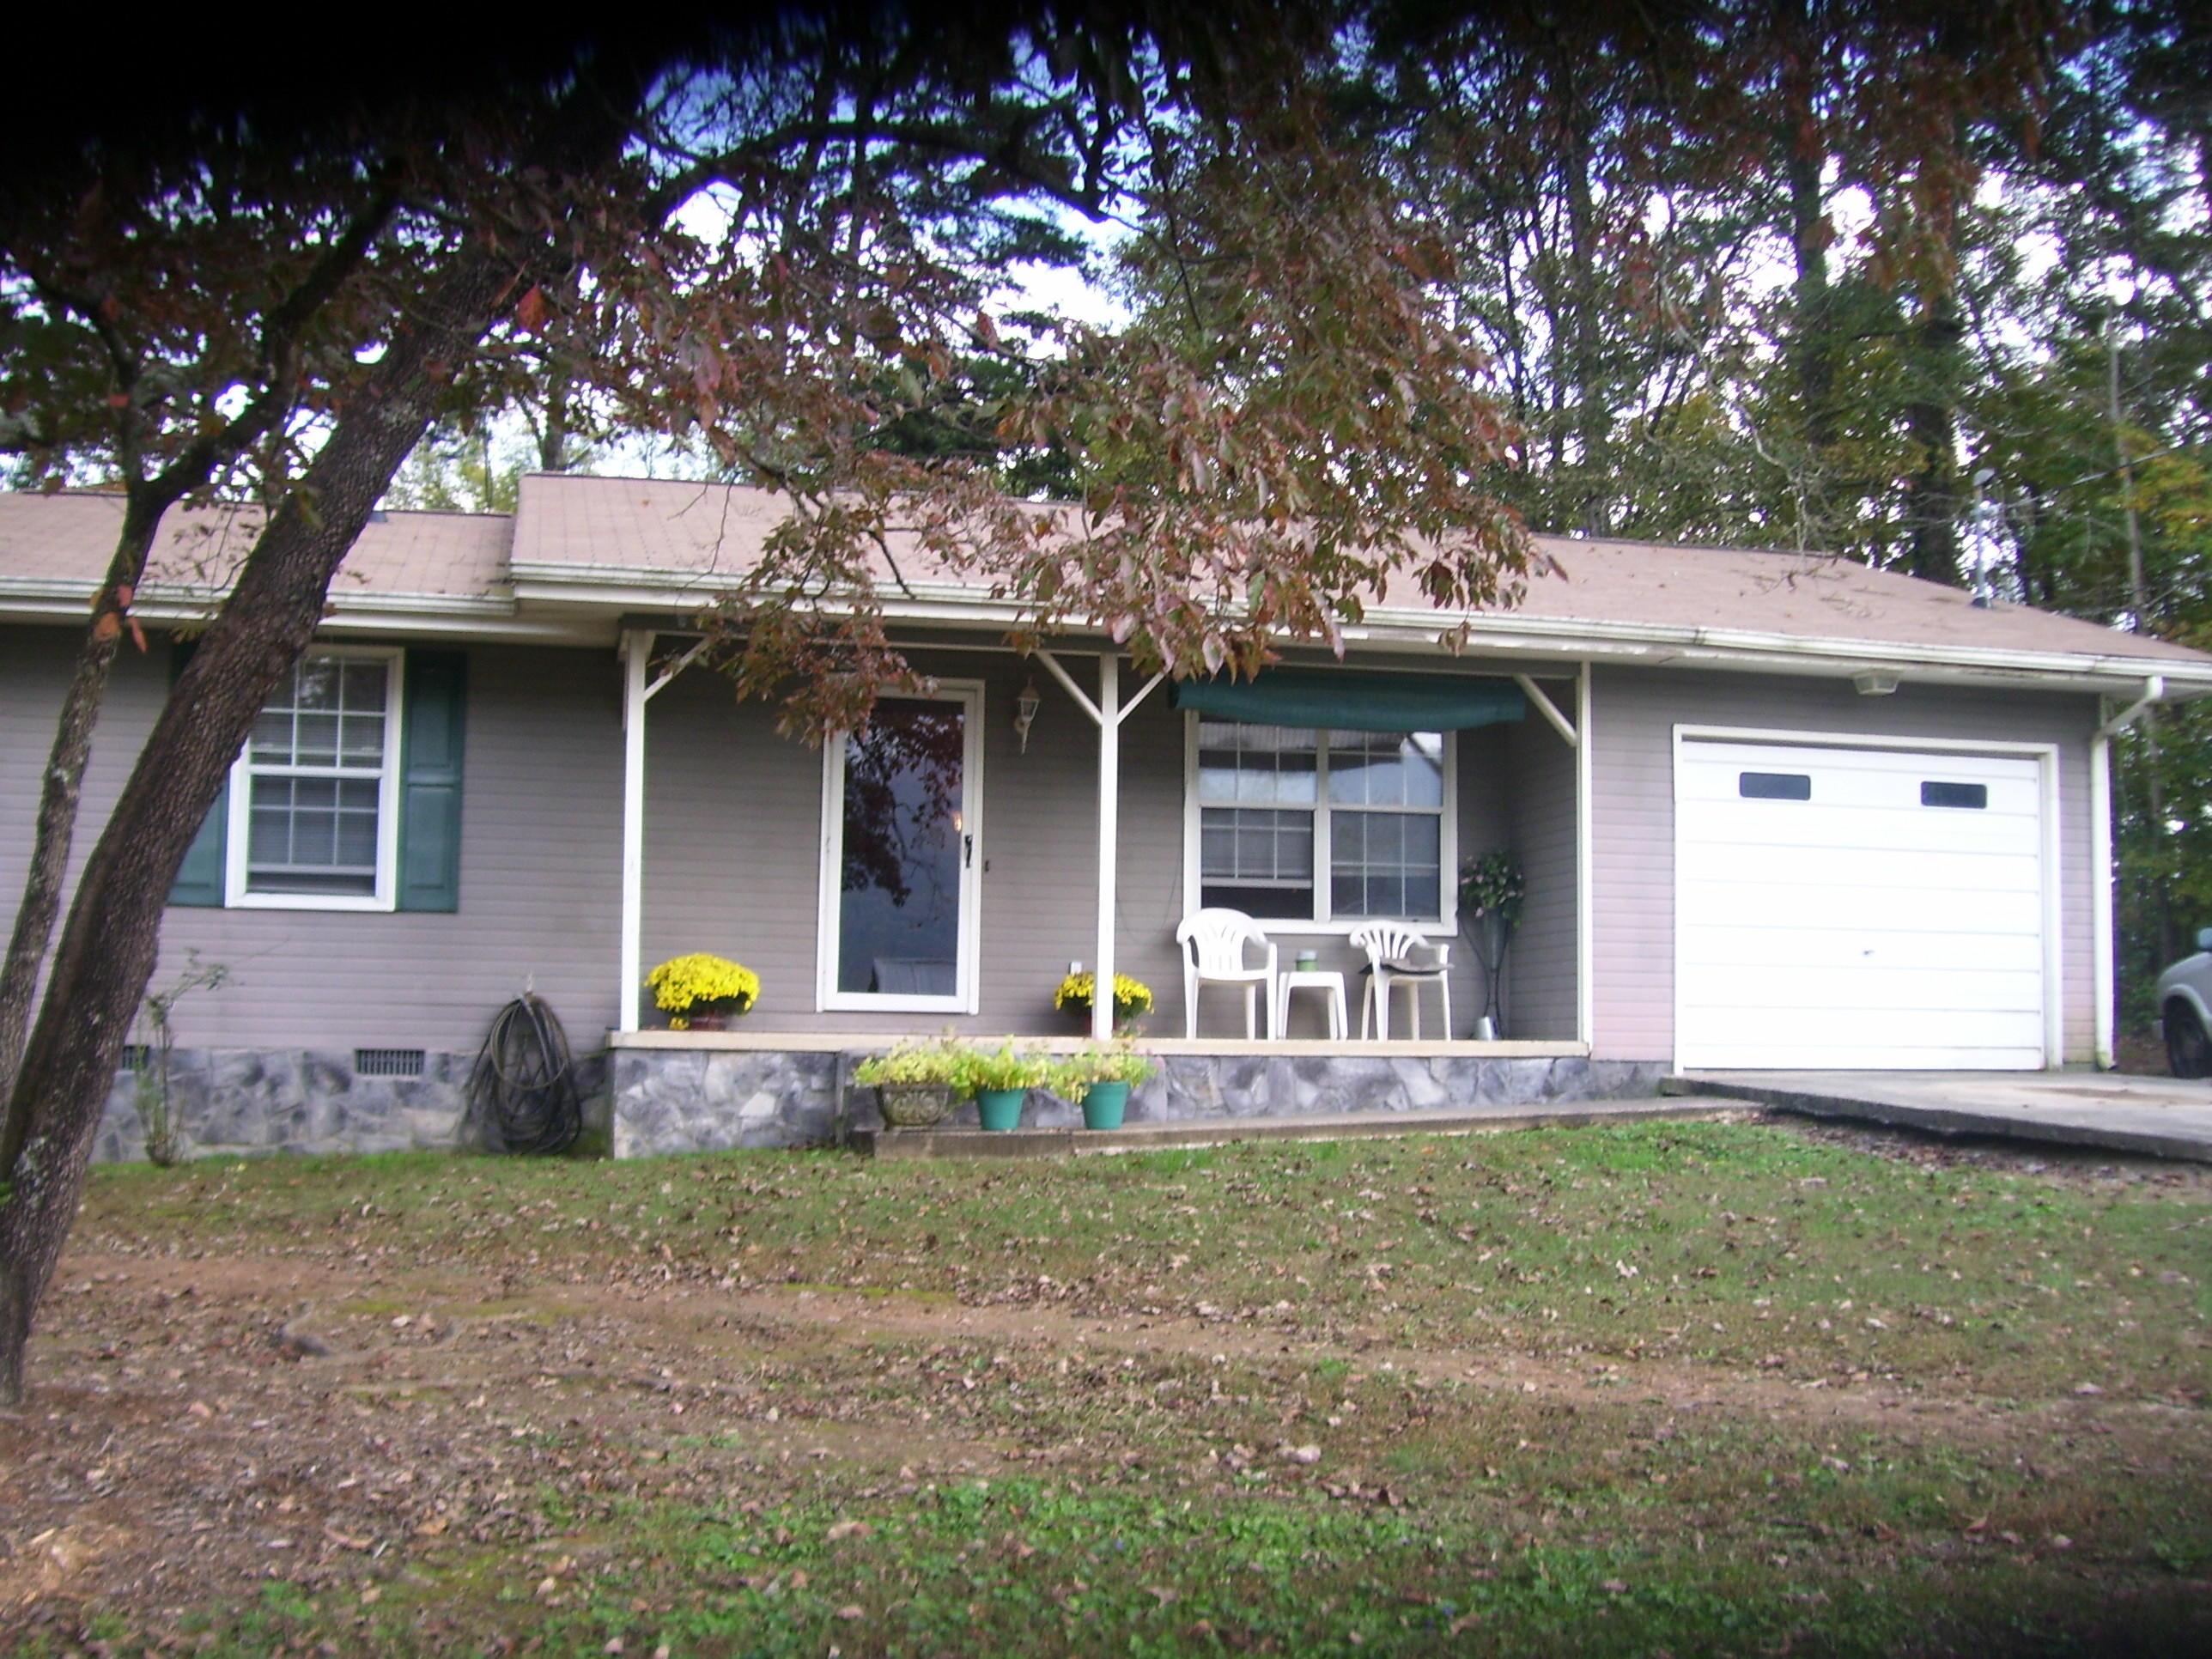 493 N Cedar St, Whitwell, TN 37397